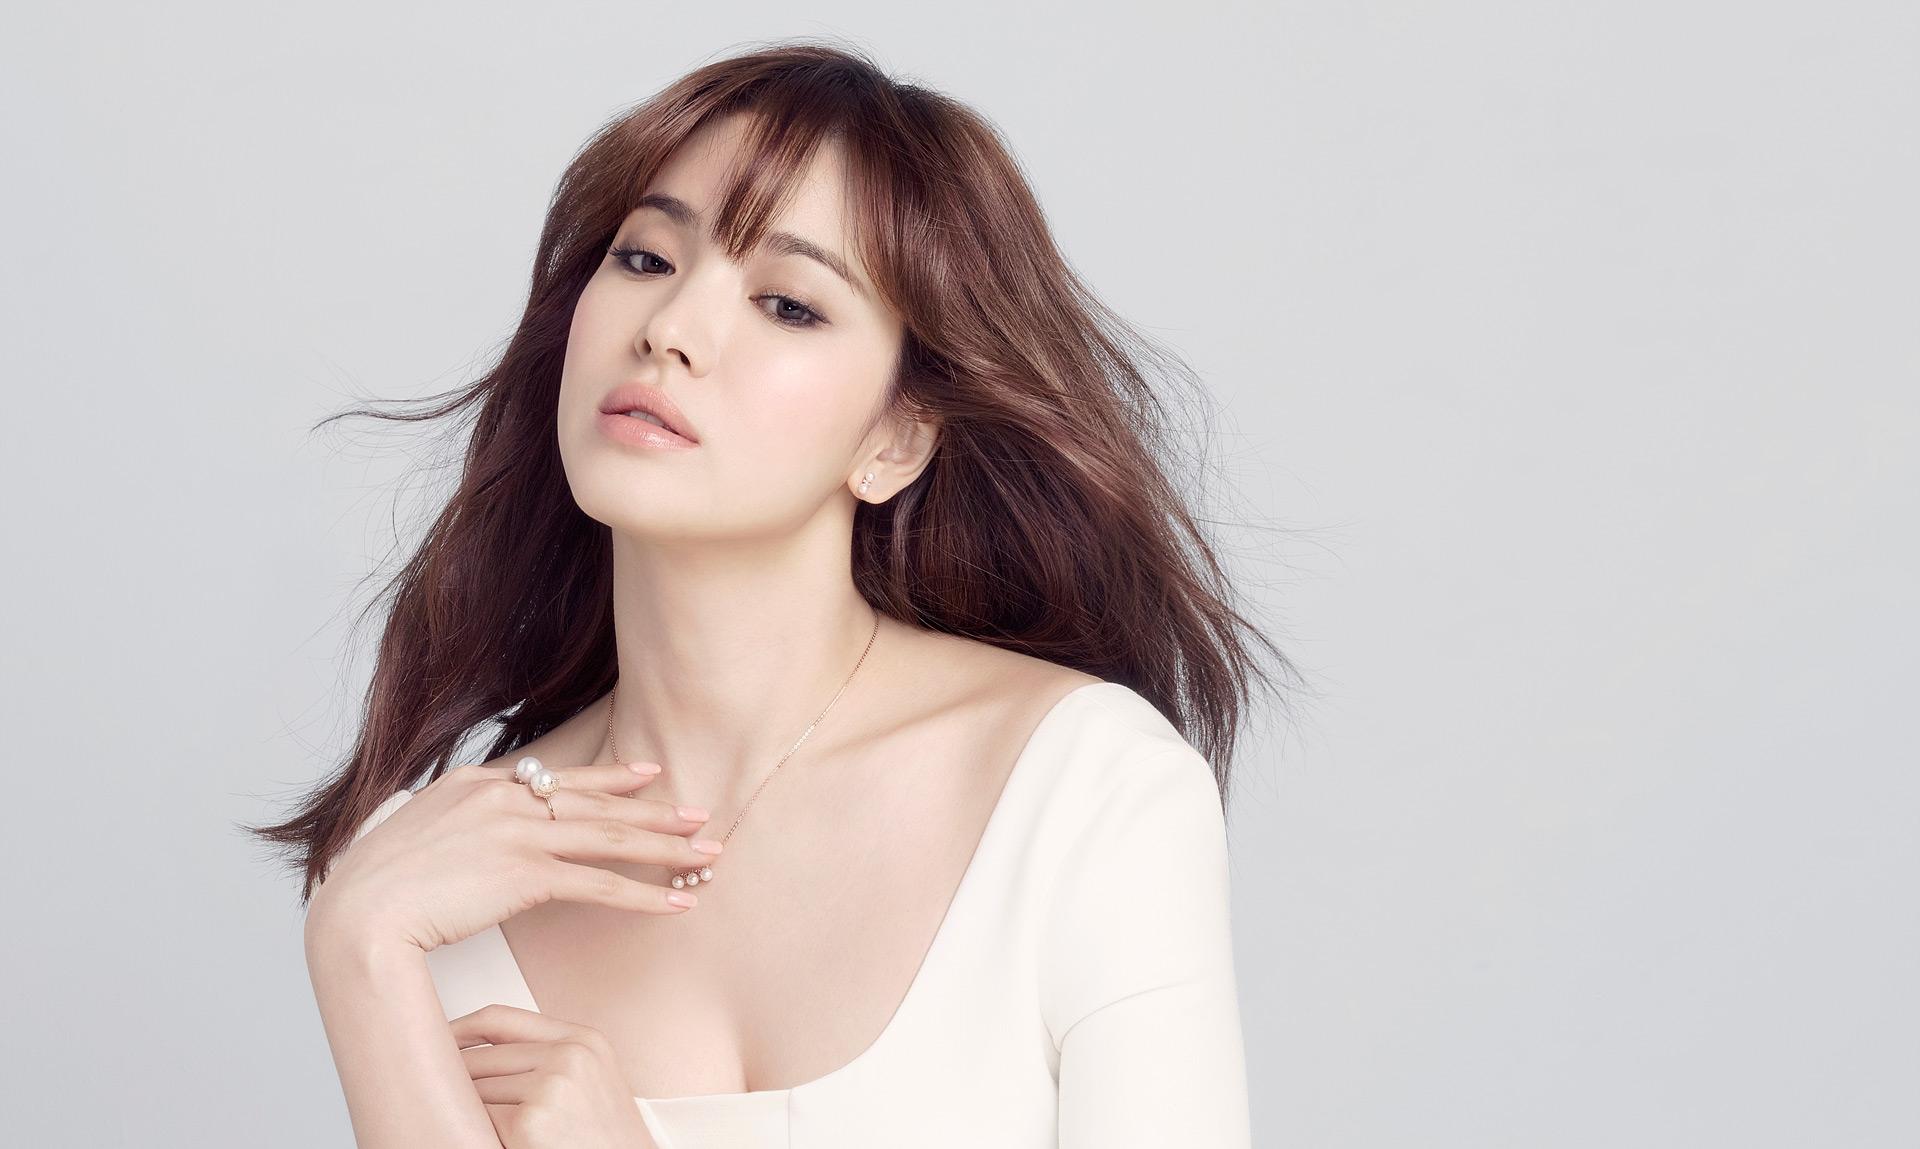 Song Joong Ki Bakal Jadi Guest di Jumpa Fans Song Hye Kyo?